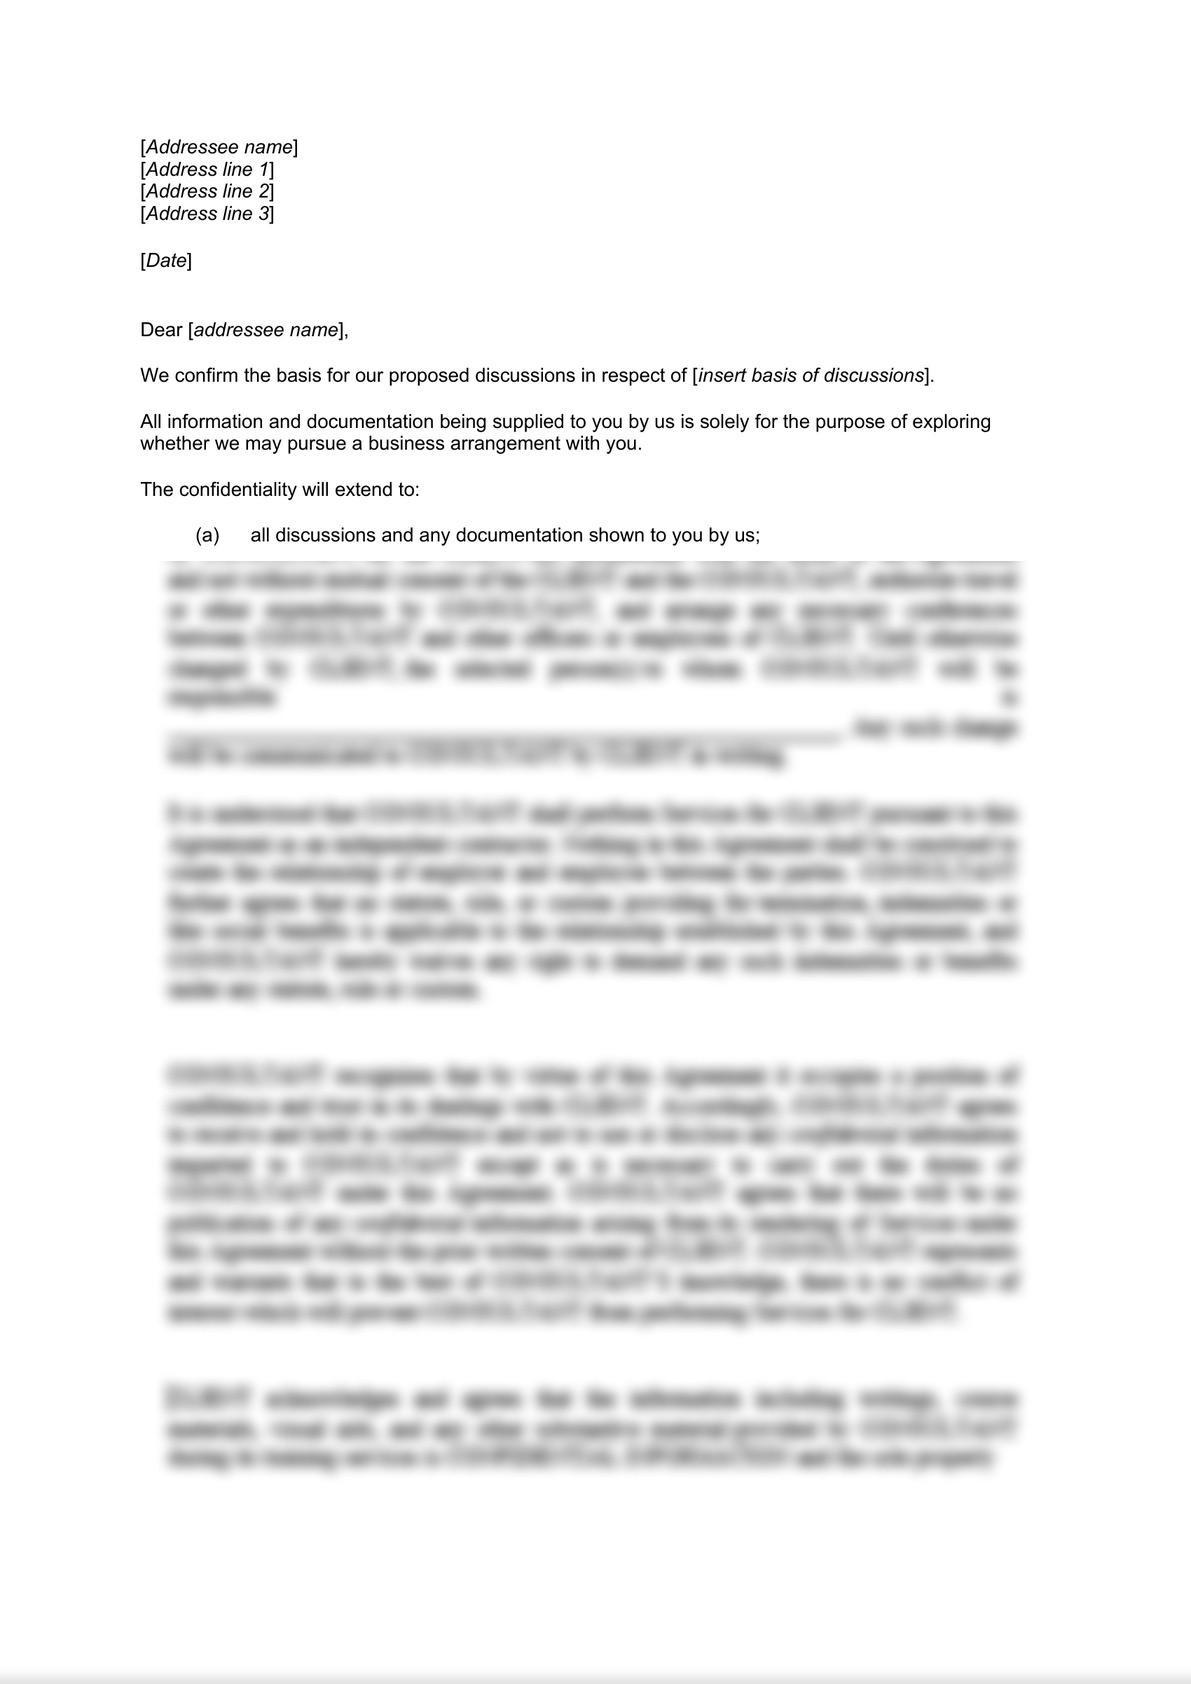 Confidentiality Letter - Short Form-0